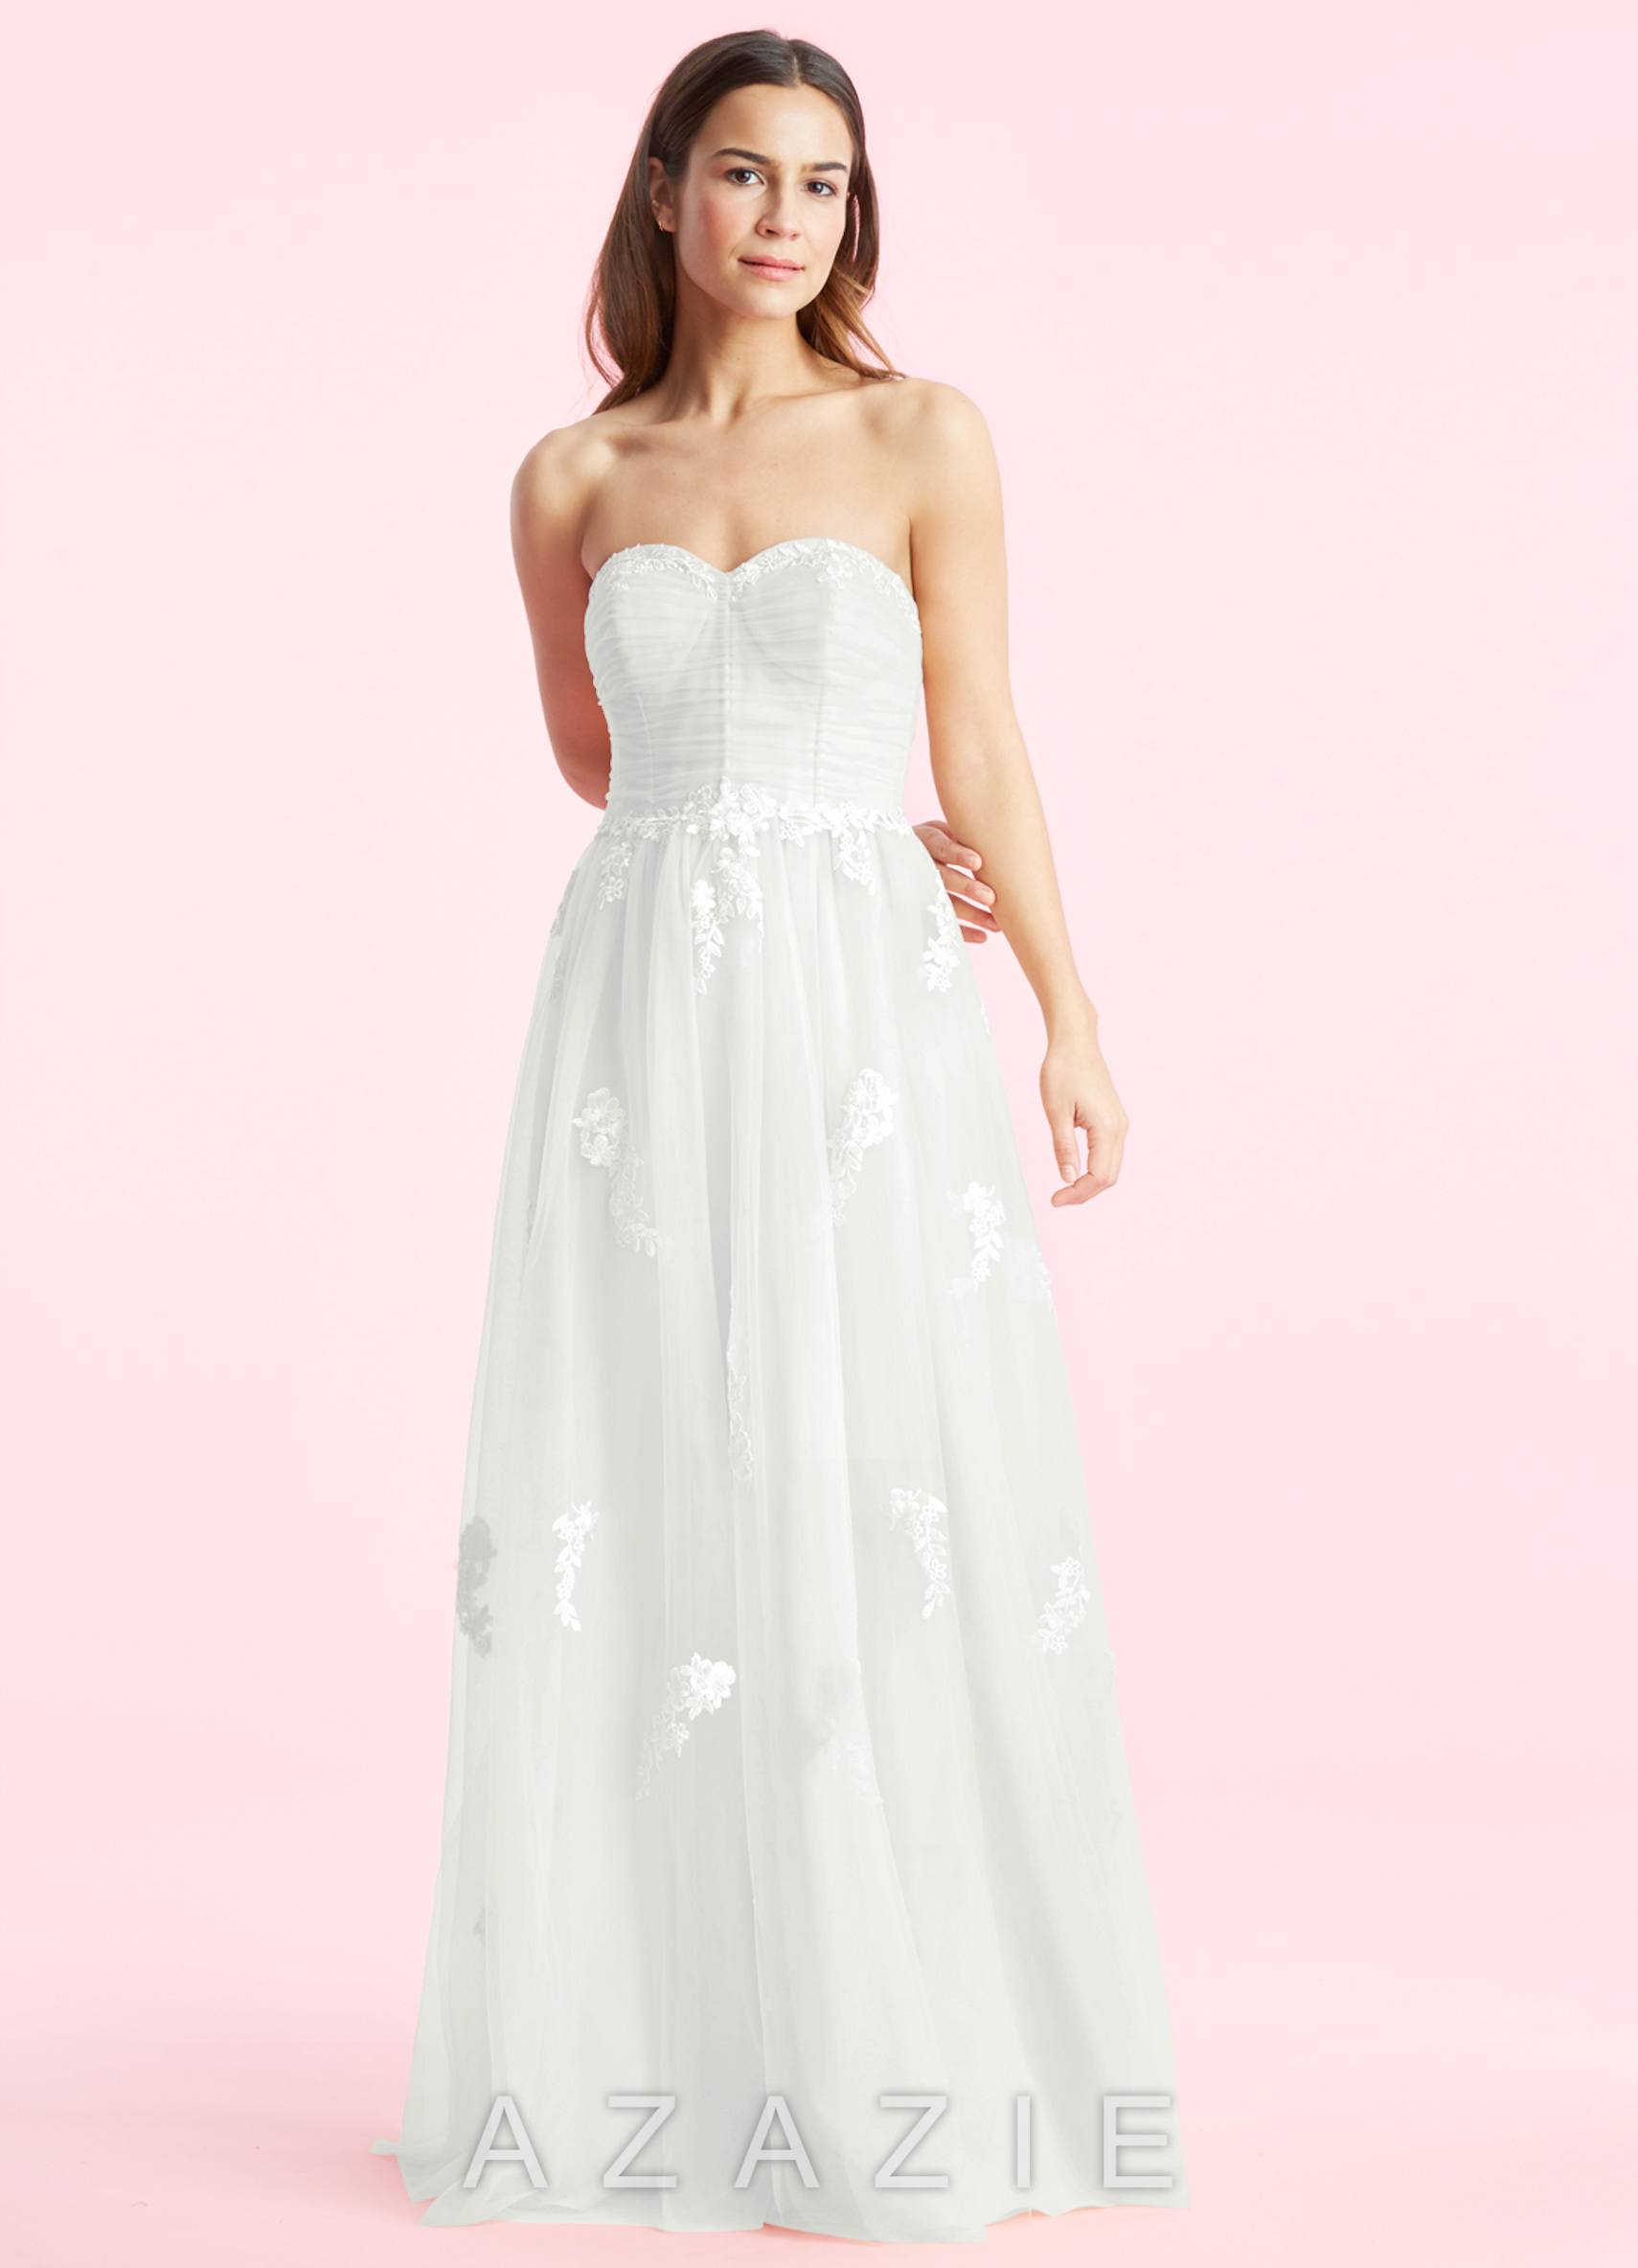 Azazie quinn bg wedding dress azazie for Ivory color wedding dress